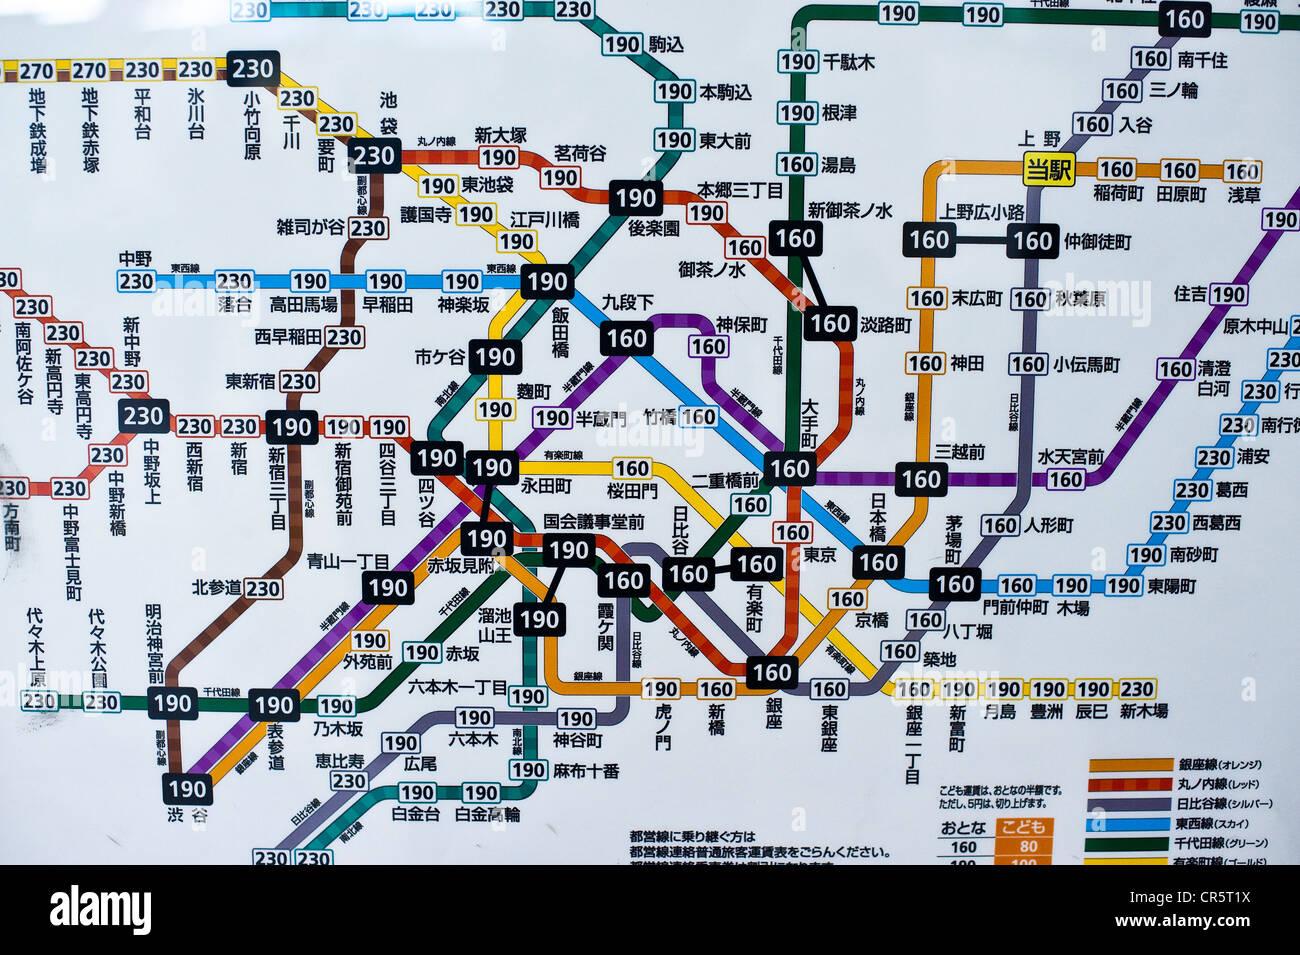 Japan, Honshu Island, Tokyo, Akihabara District, map of the subway